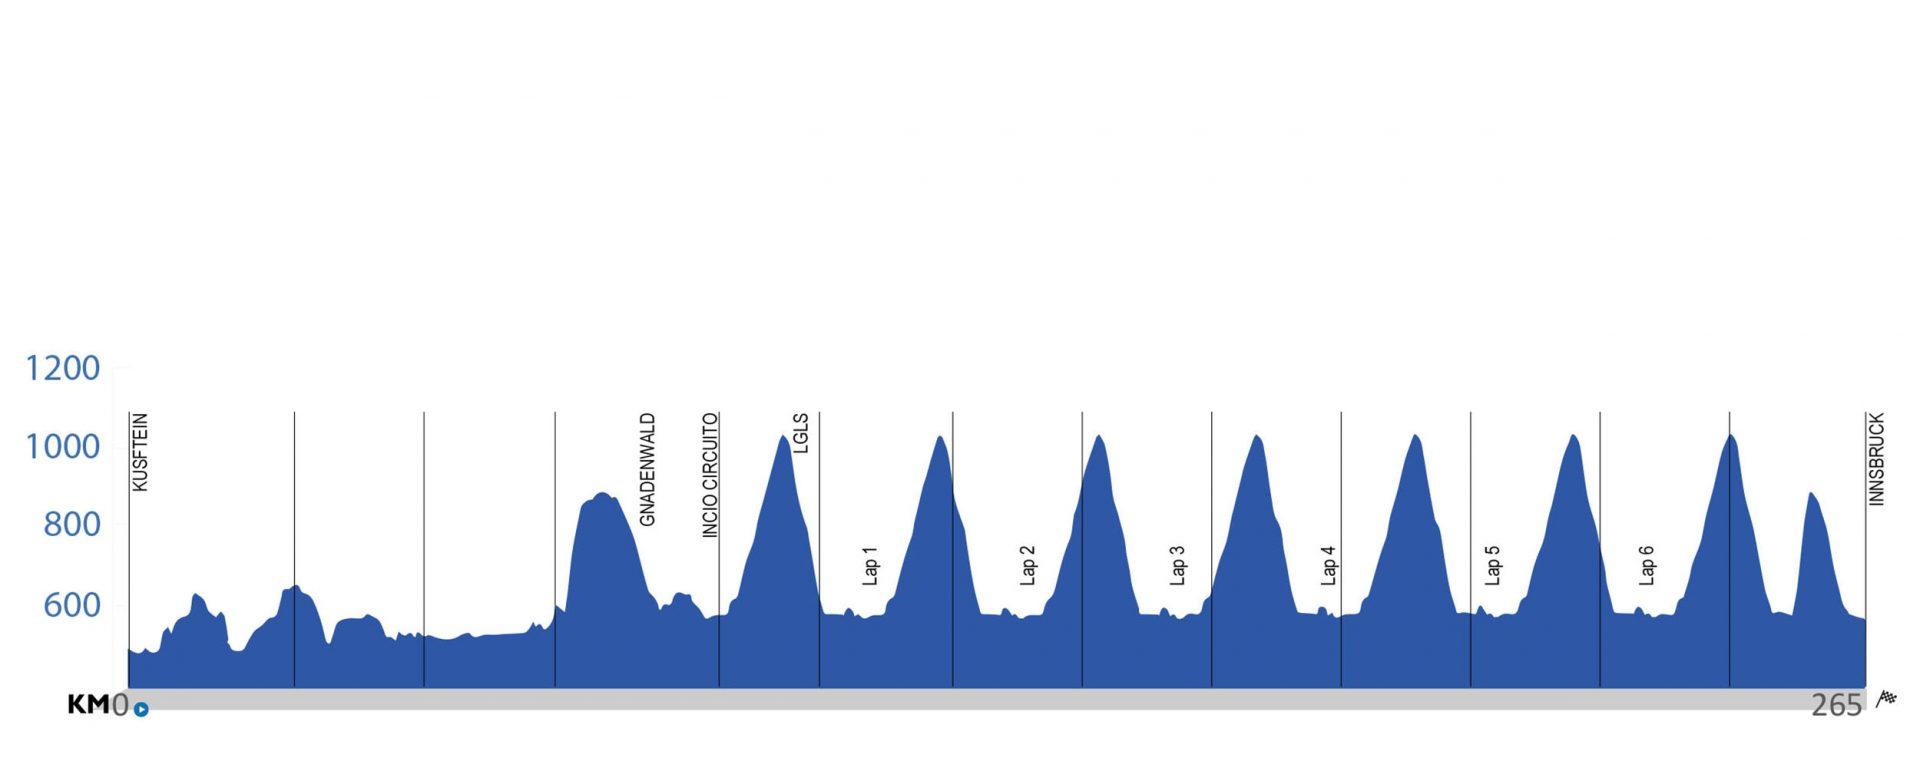 Kufstein e Innsbruck Mundial del Ciclismo Ruta. 265 kilómetros